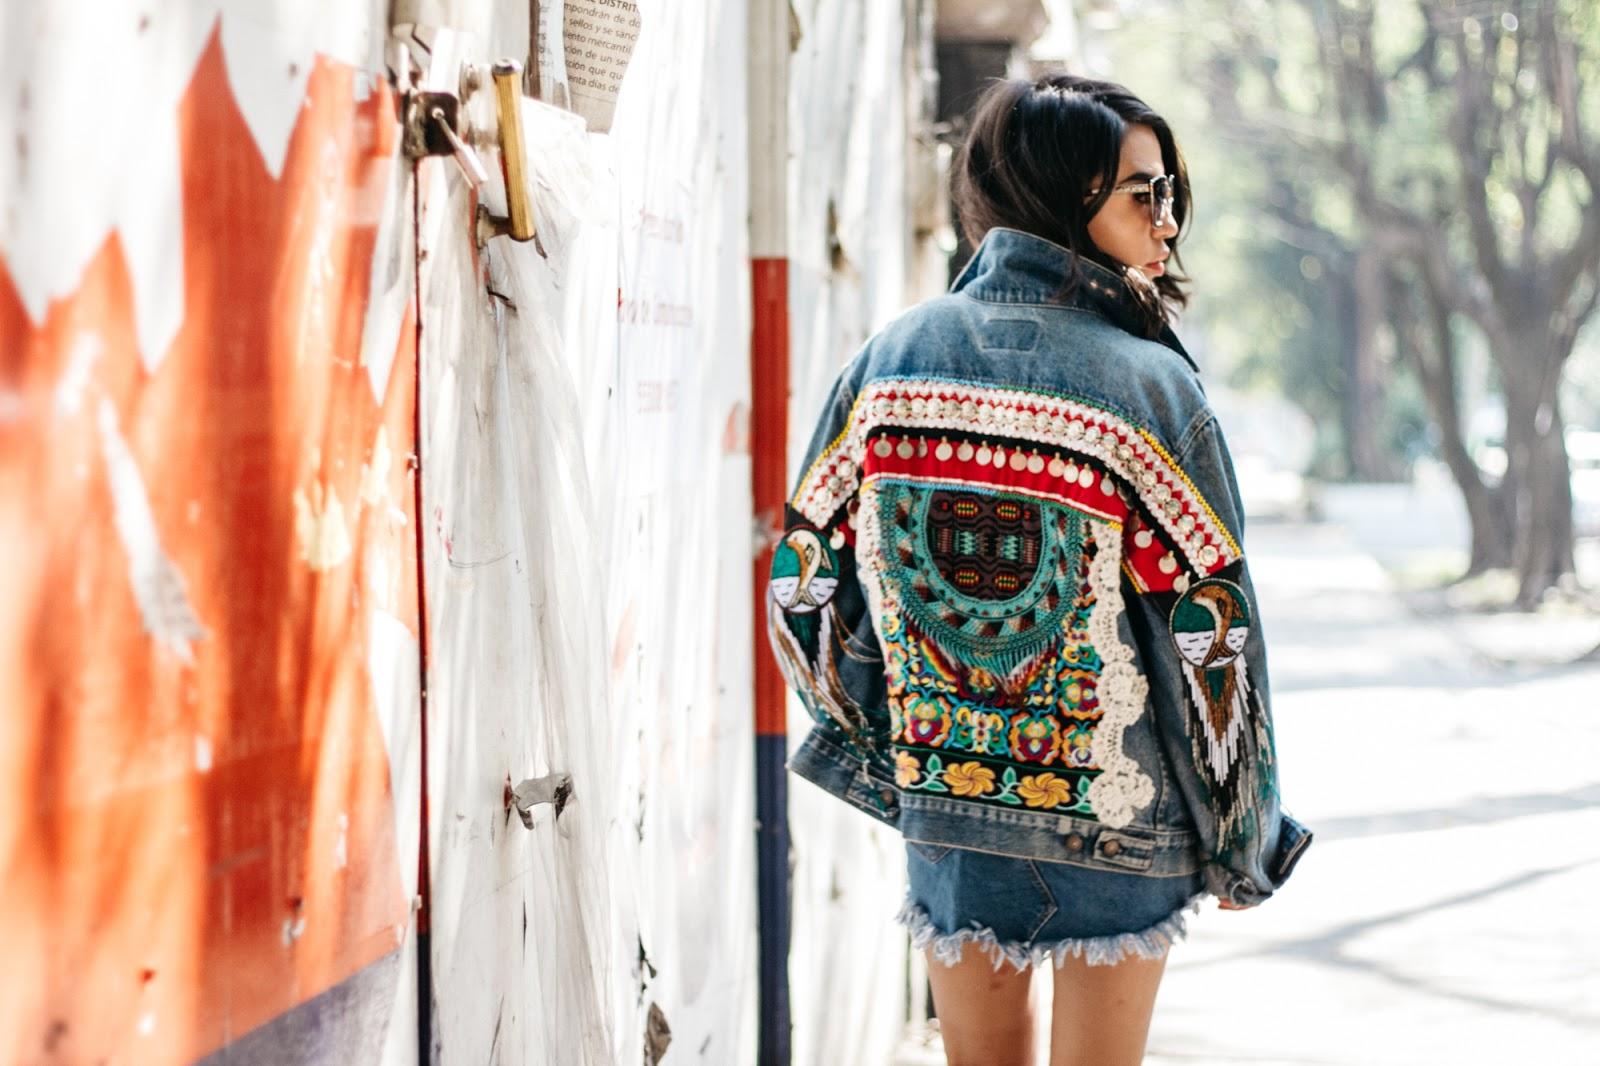 ff95475e4 Rockstar - High on Fashion